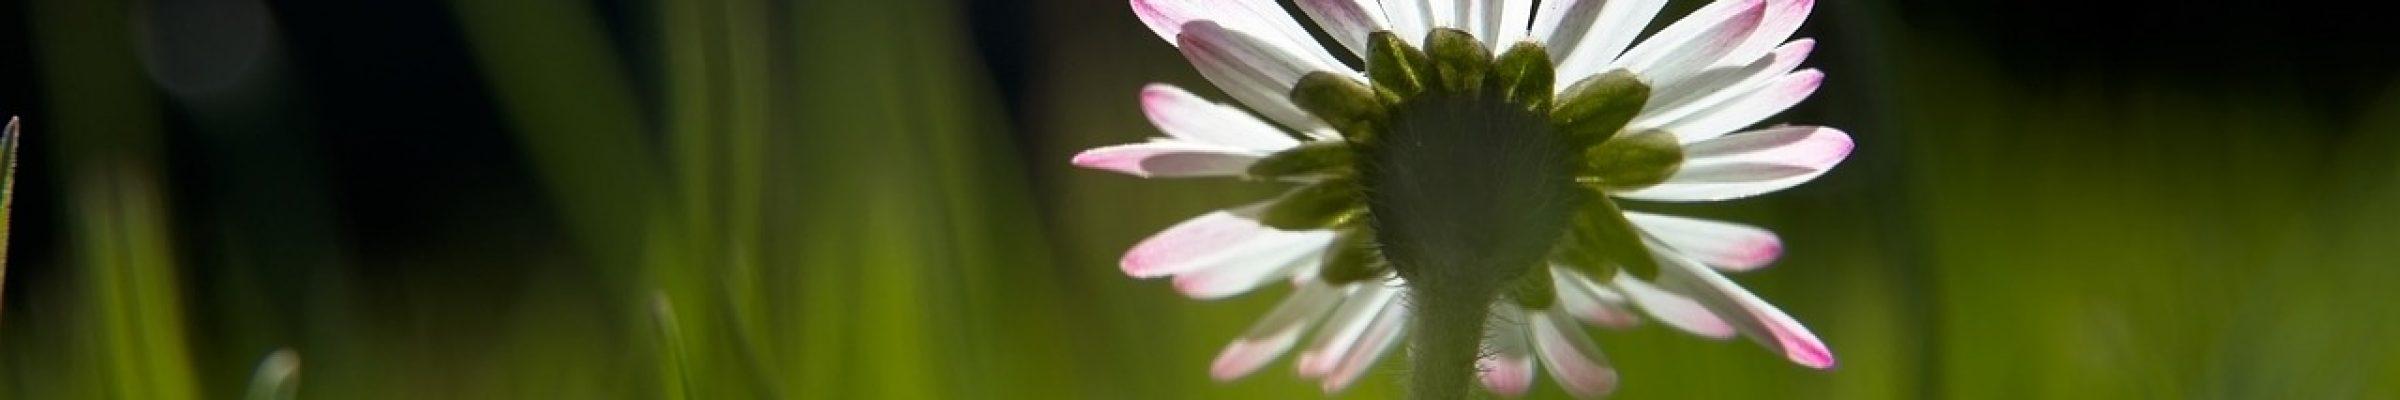 daisy, flower, plant